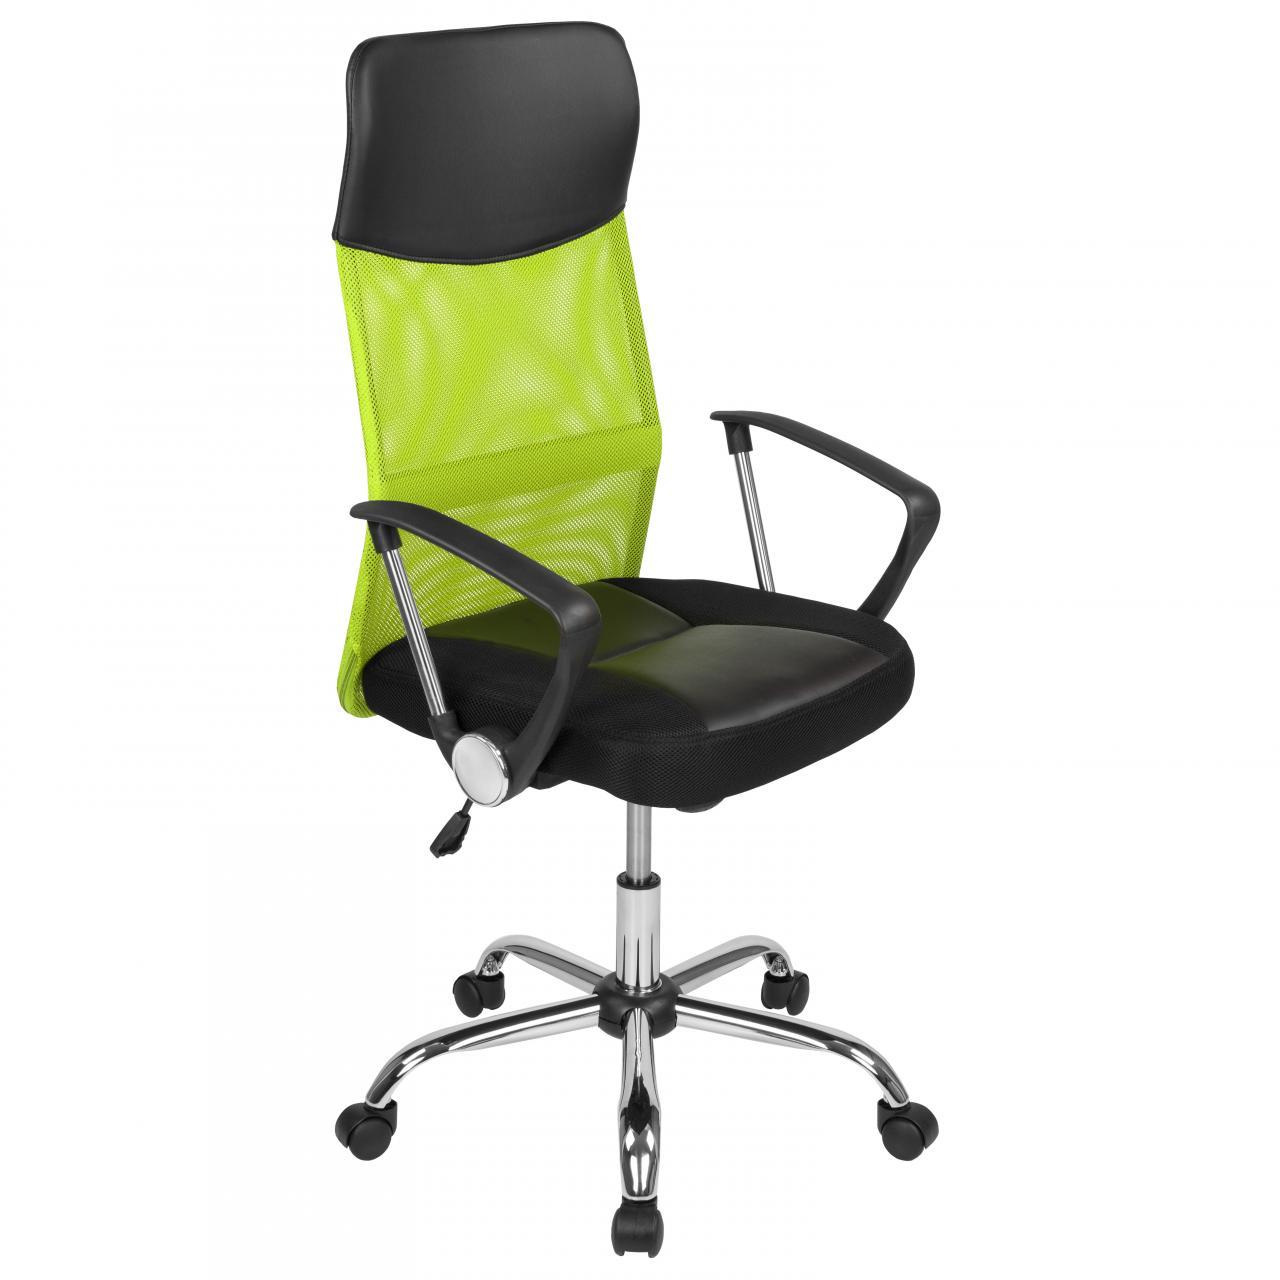 Buerostuhl-Drehstuhl-Schreibtischstuhl-Buerosessel-Buero-Stuhl-Sessel-Buerodrehstuhl